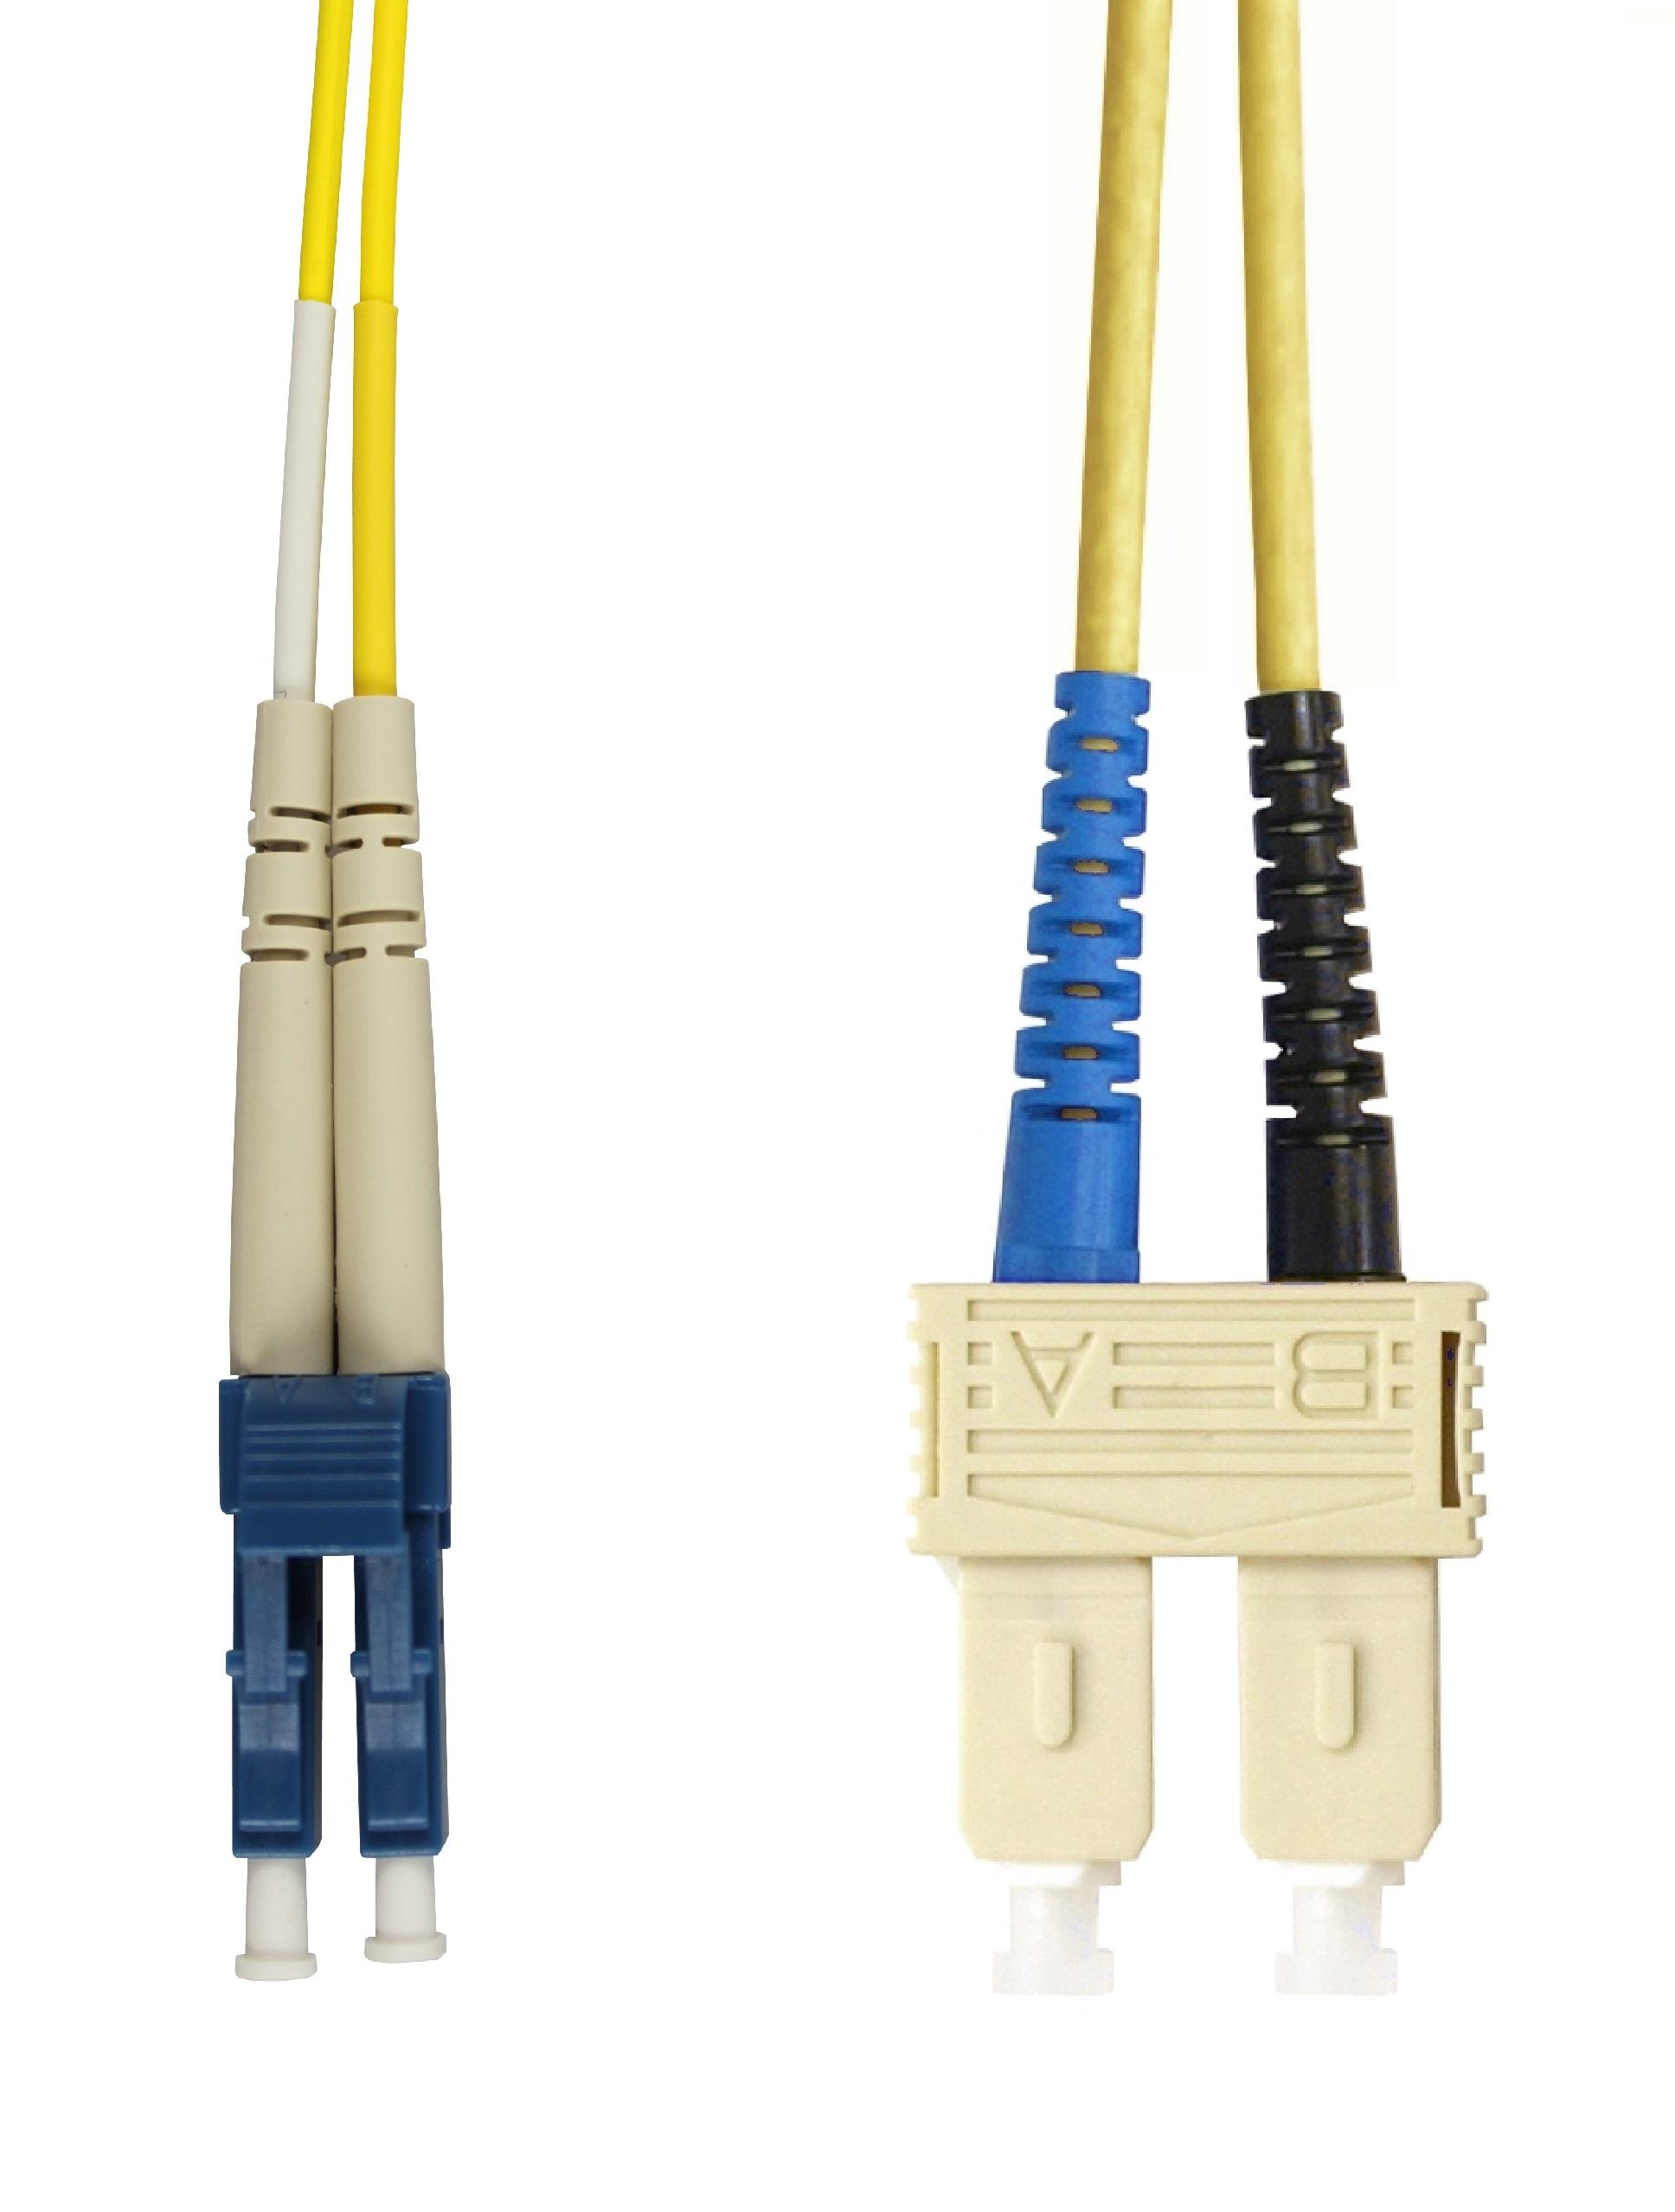 1 Stk LWL Patchkabel Duplex LC/SC, 9/125µm OS2, LS0H-3, gelb,10.0m HLP29LC10F